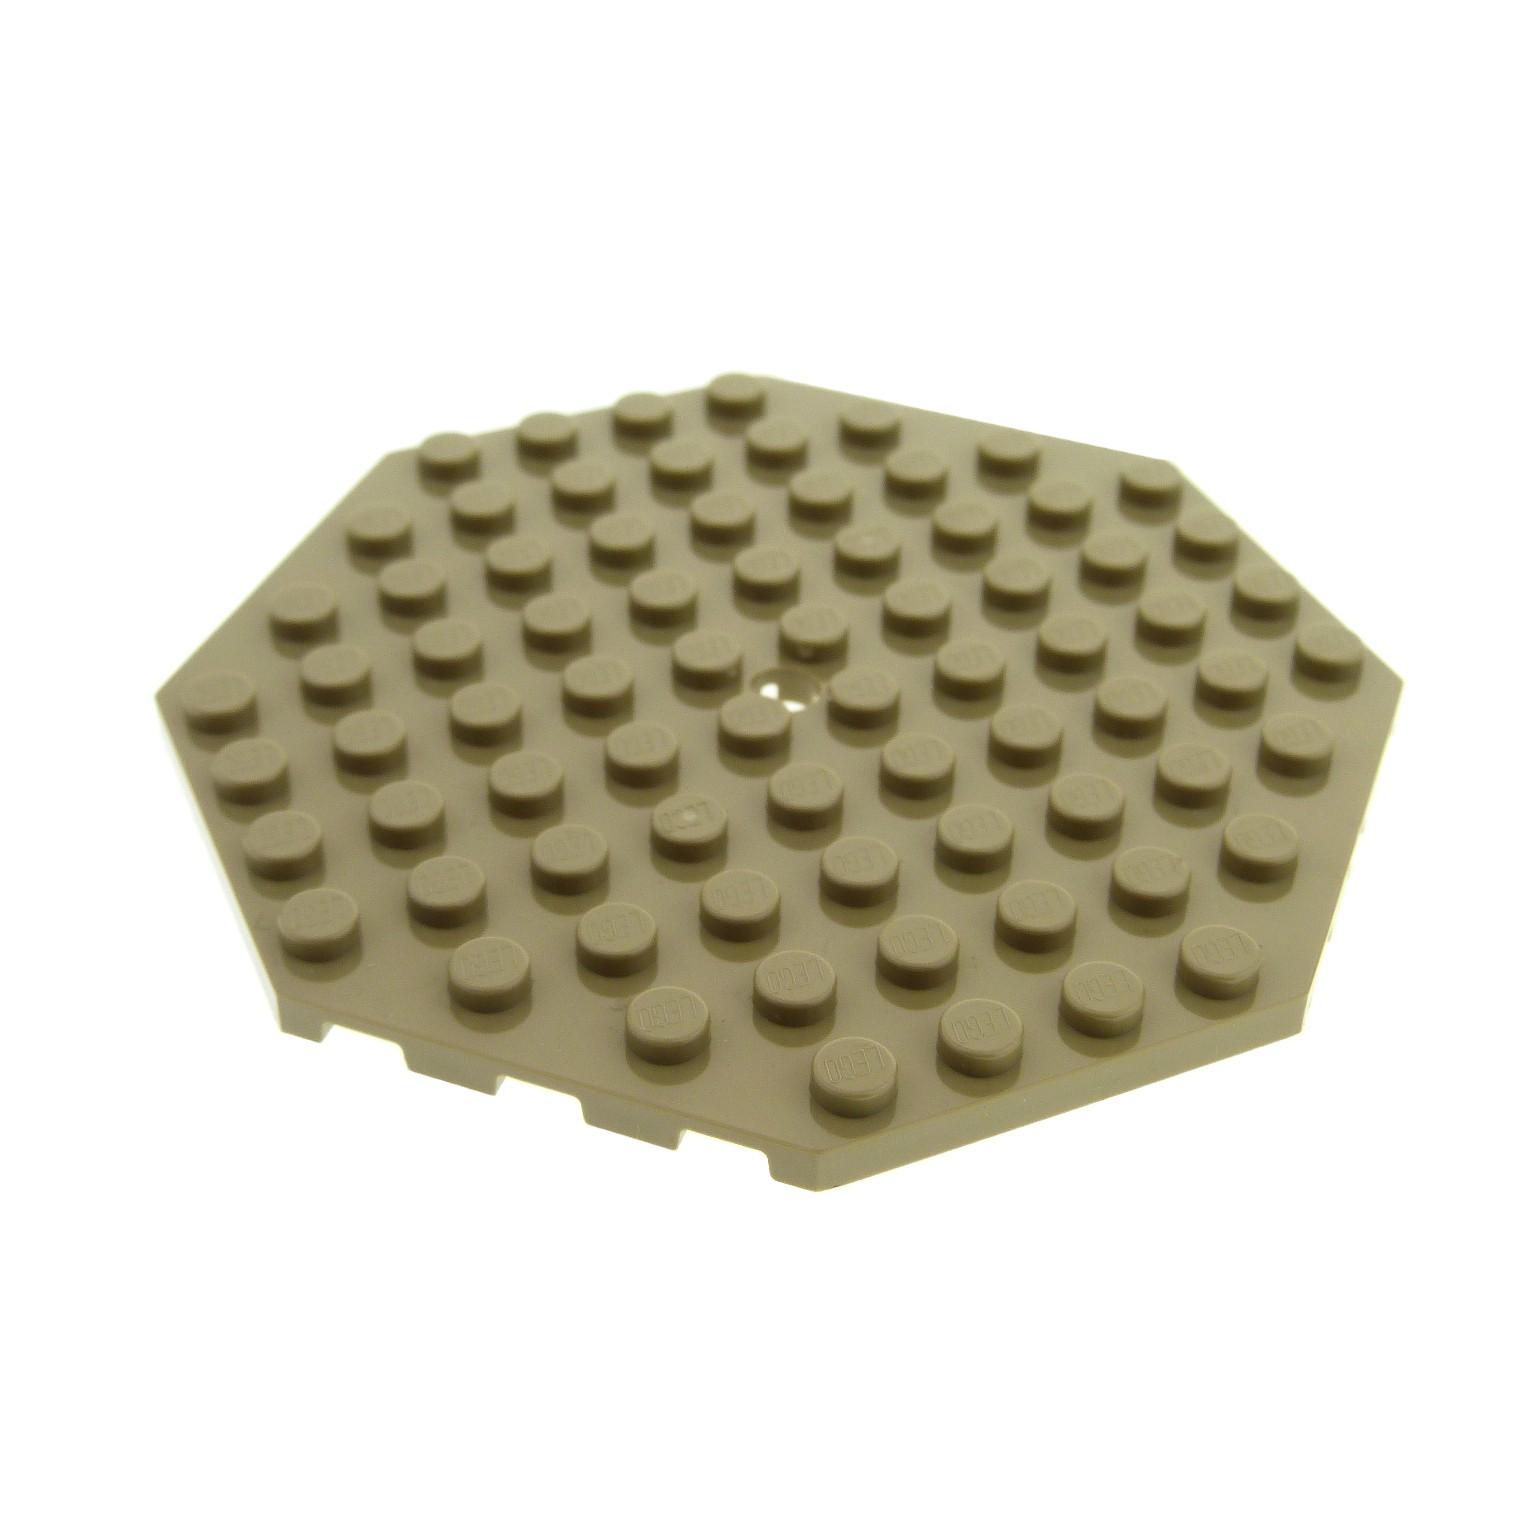 1 x Lego System Bau Platte dunkel beige tan 10x10 Star Wars 9496 4584485 89523